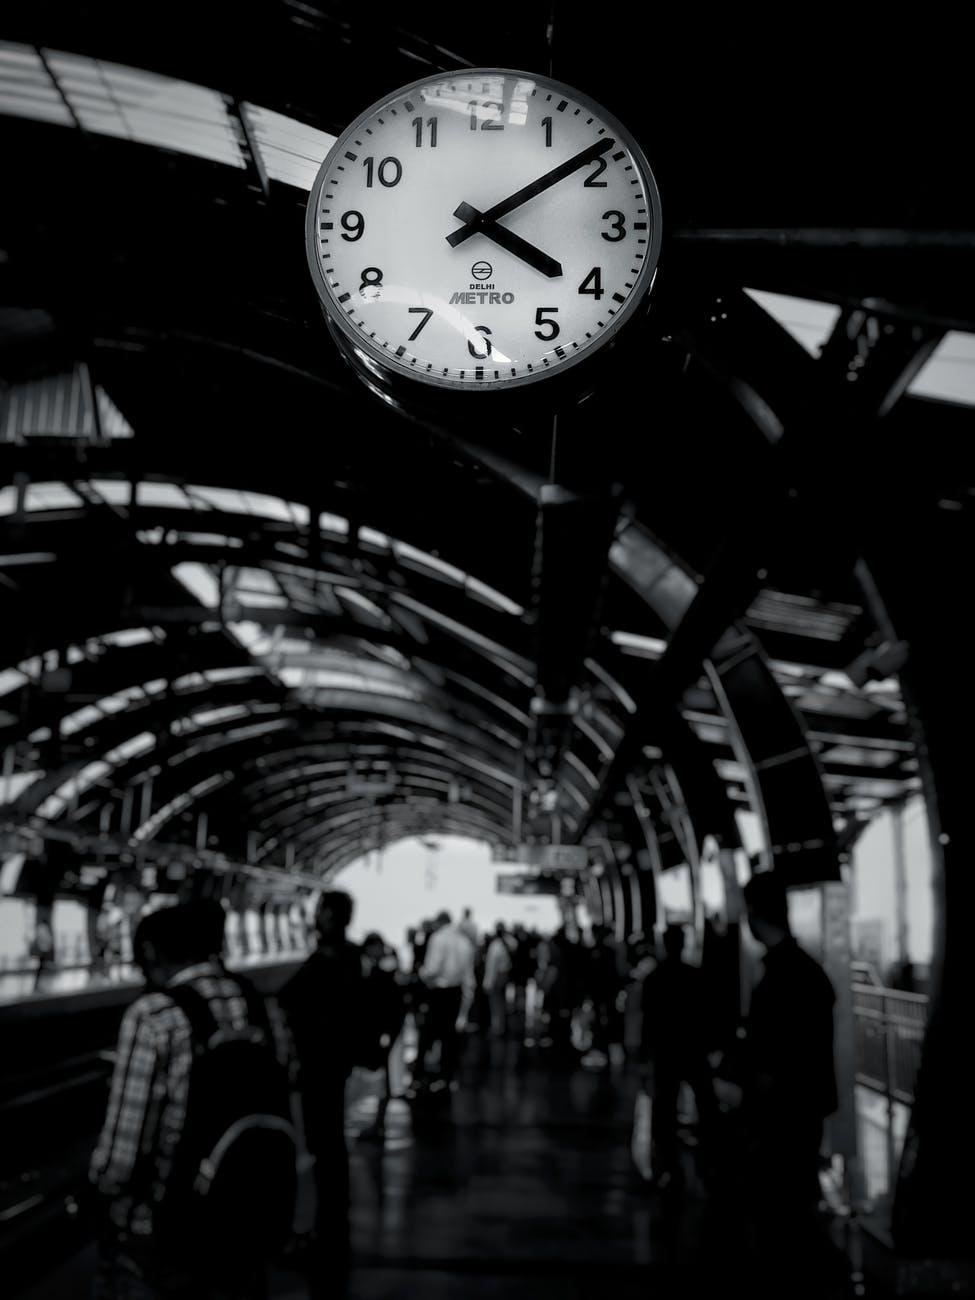 The rush hour.